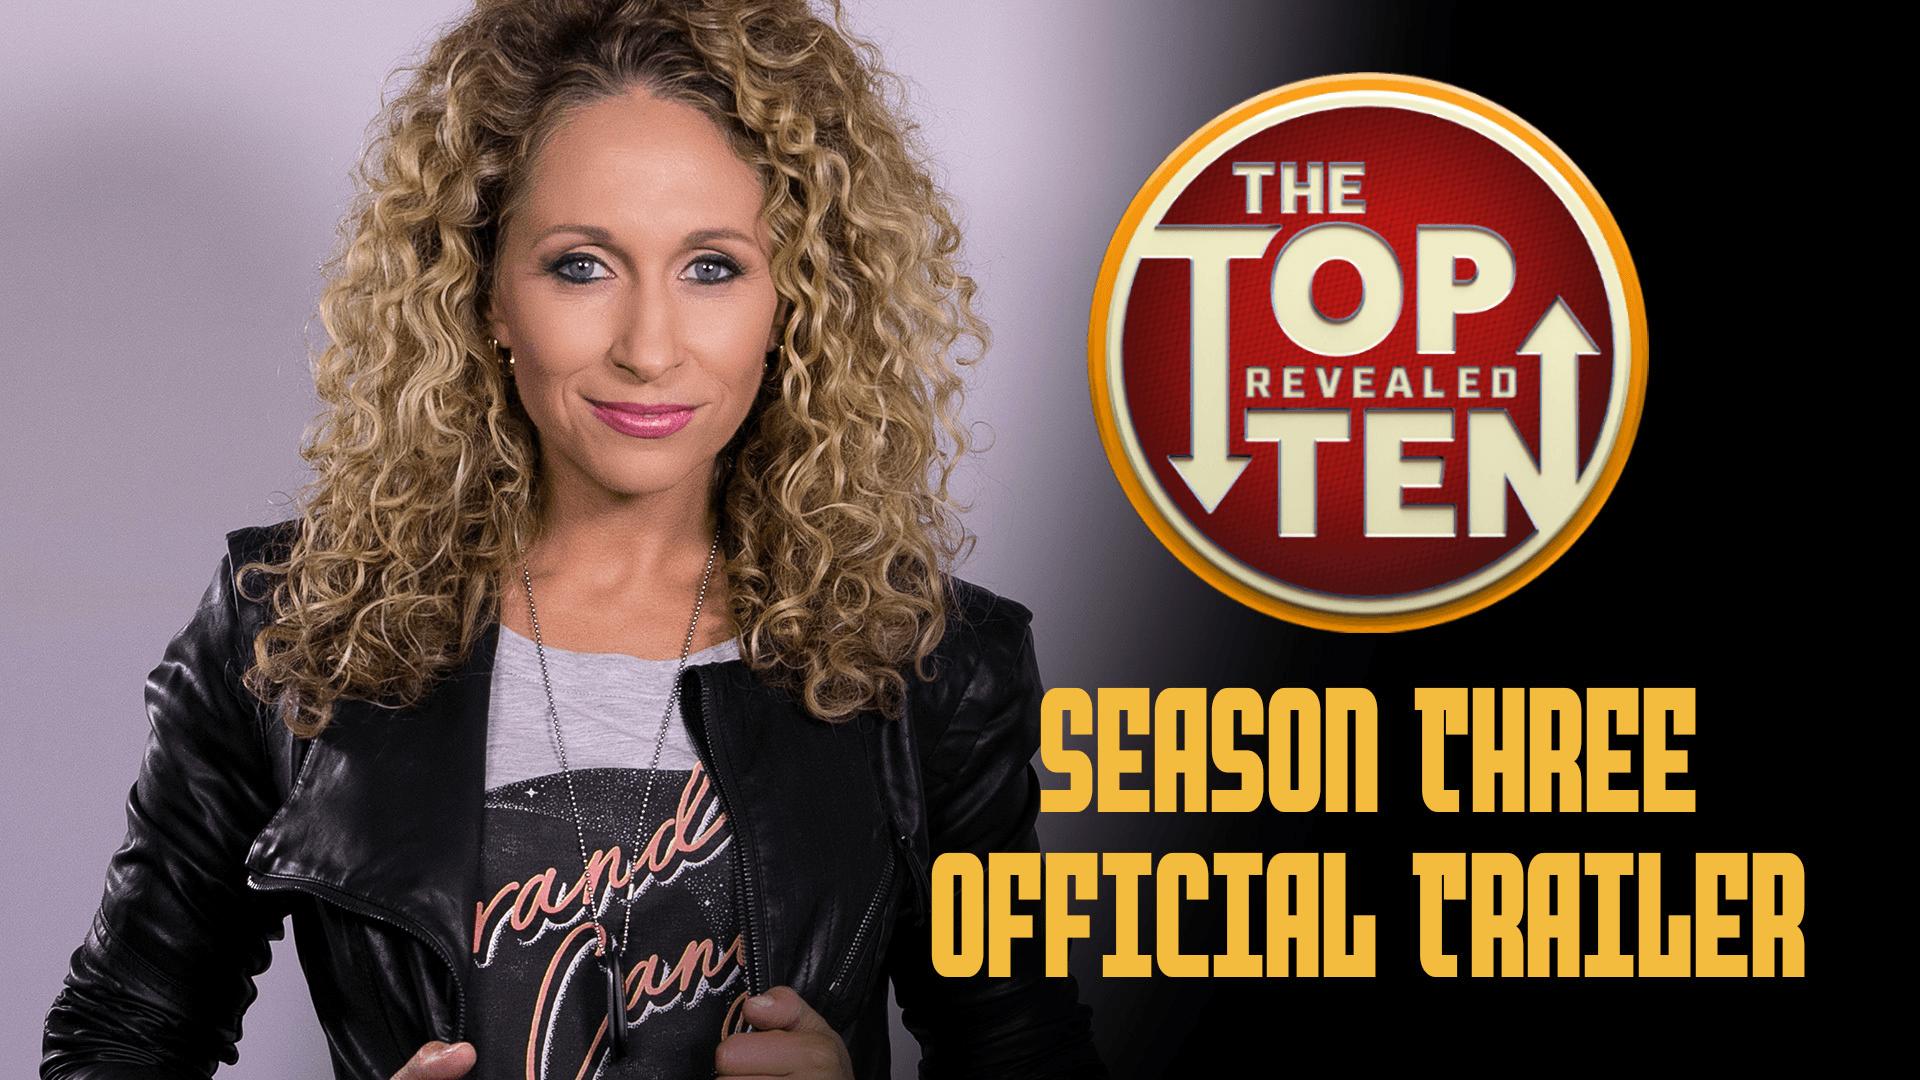 The Top Ten Revealed | Season 3 Trailer